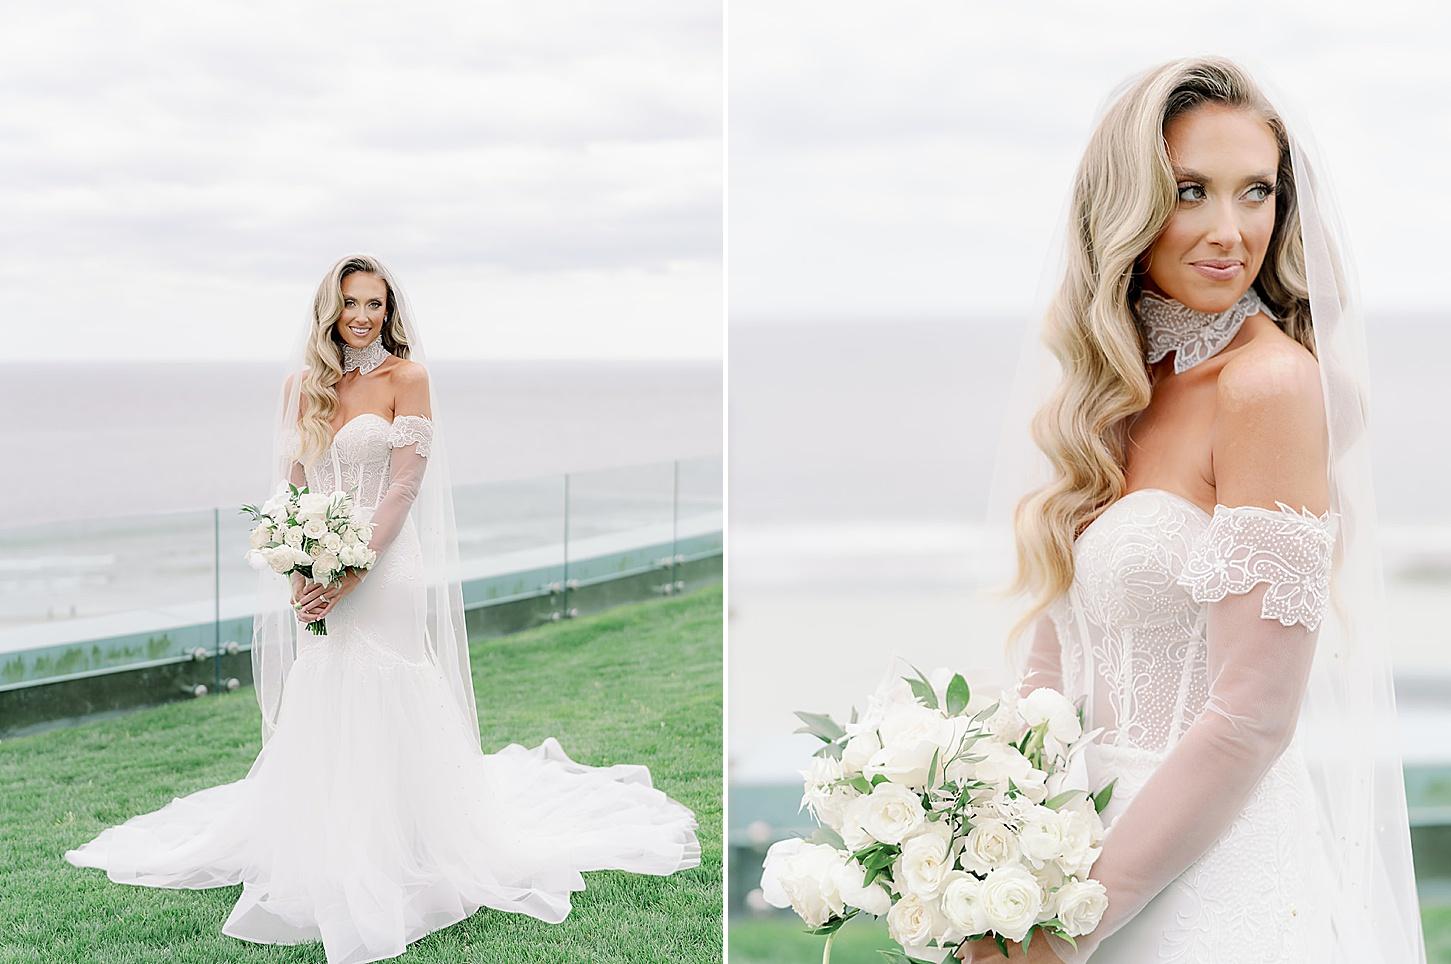 Atlantic City Wedding Photography Studio by Magdalena Studios Lexy Cha 0064